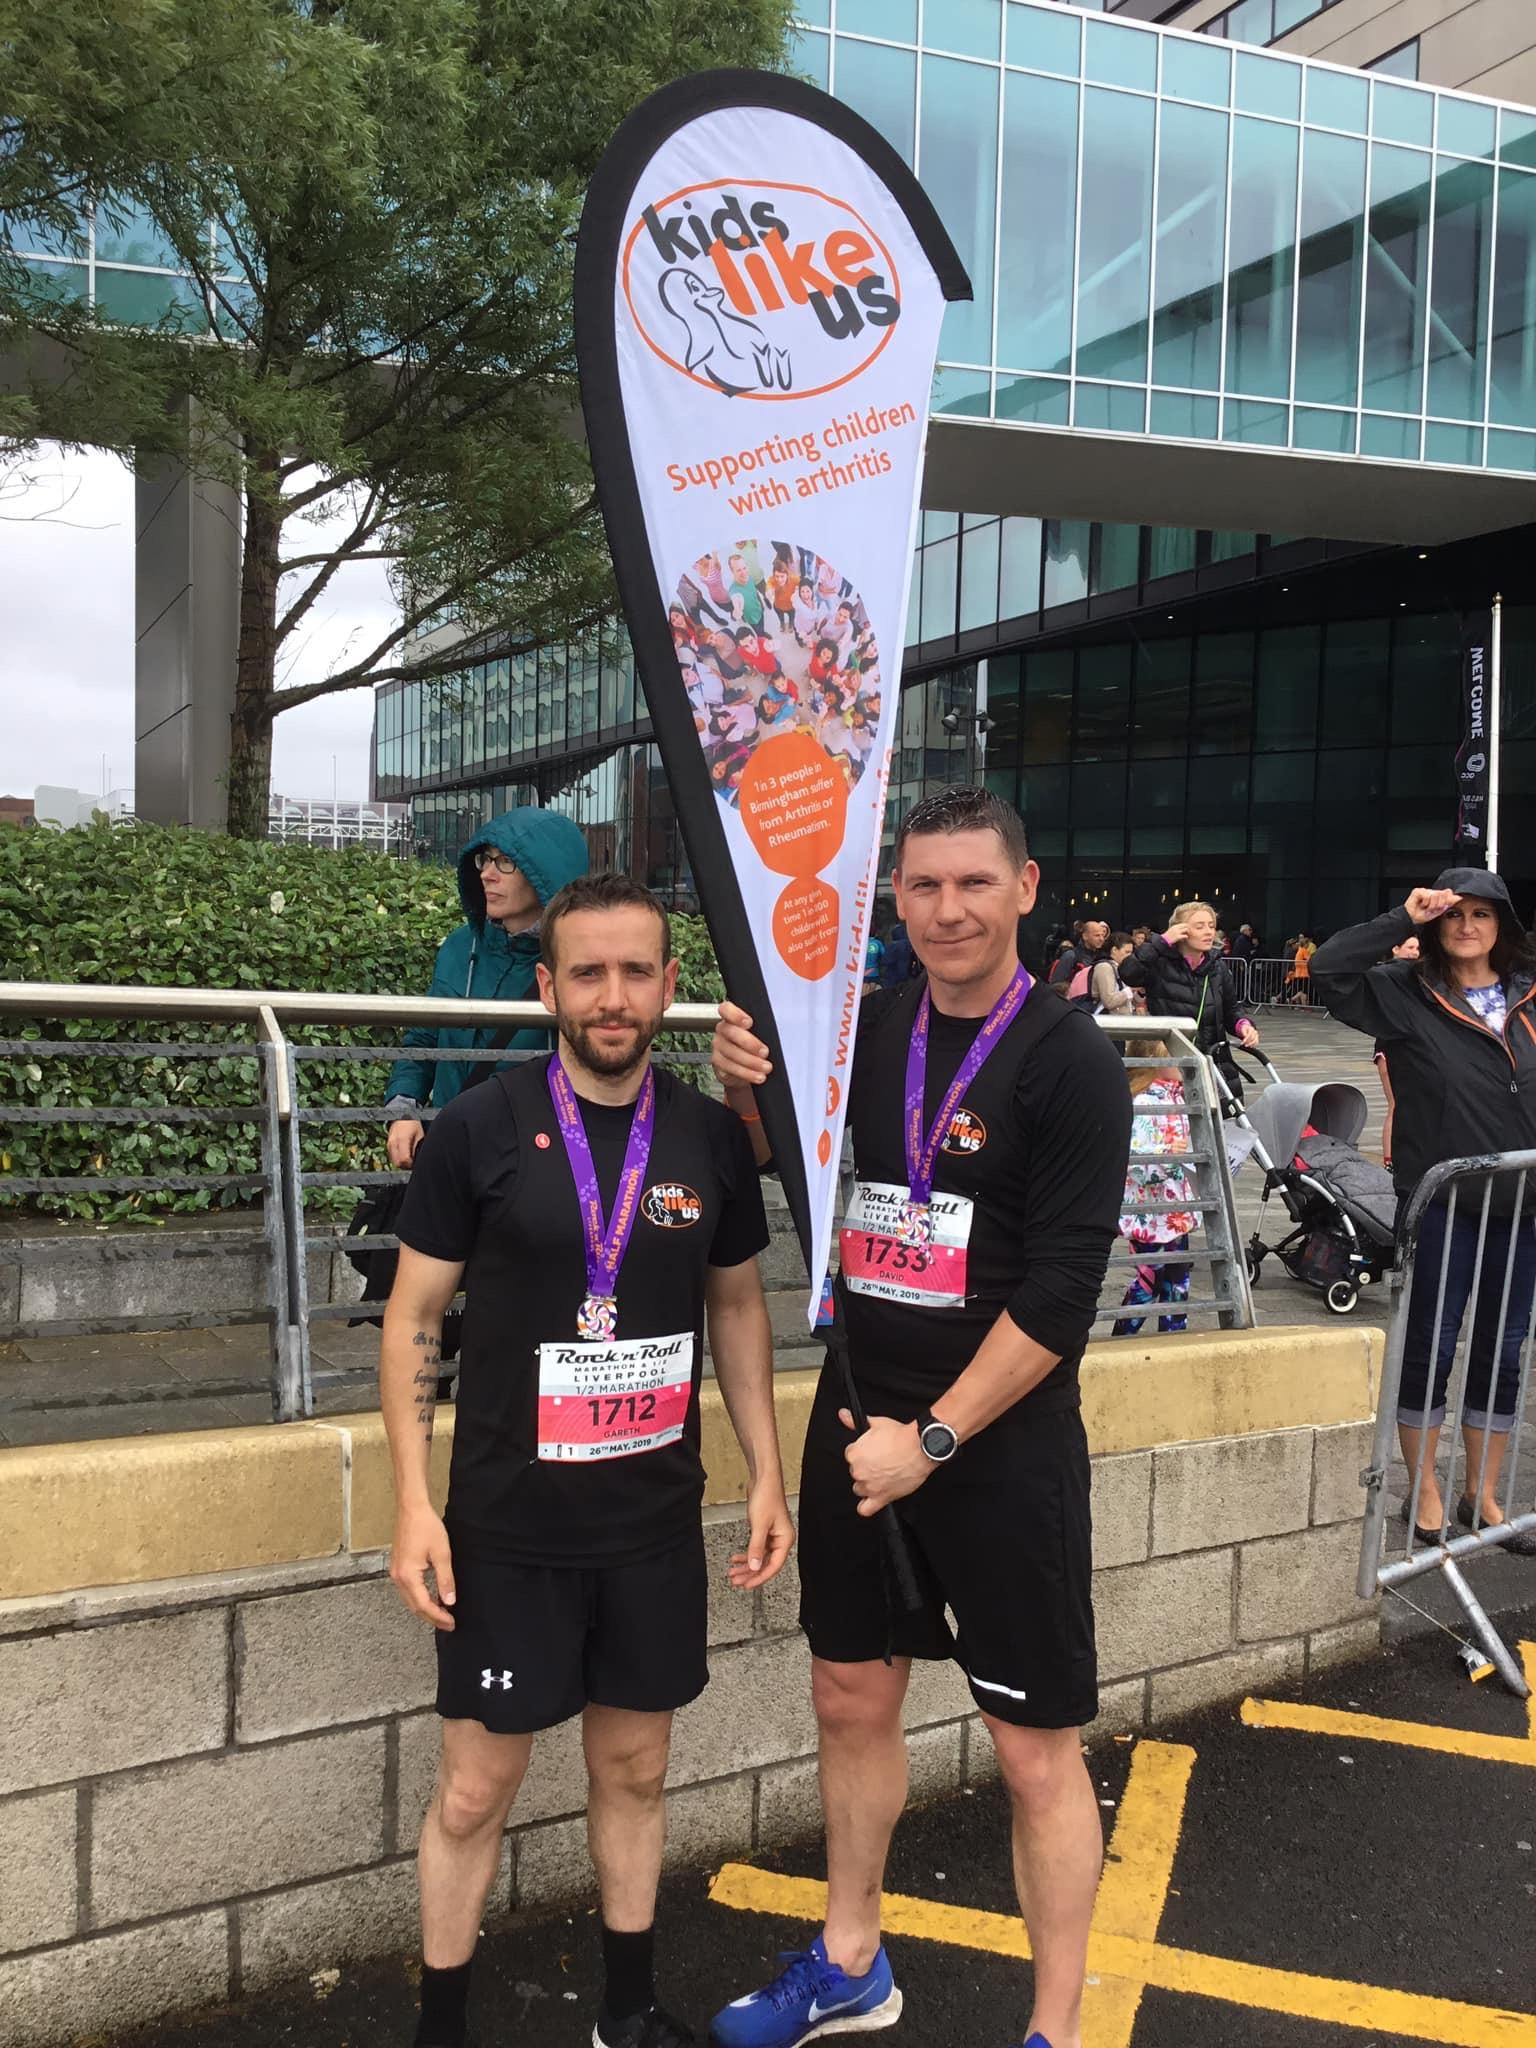 Liverpool Rock & Roll Half Marathon